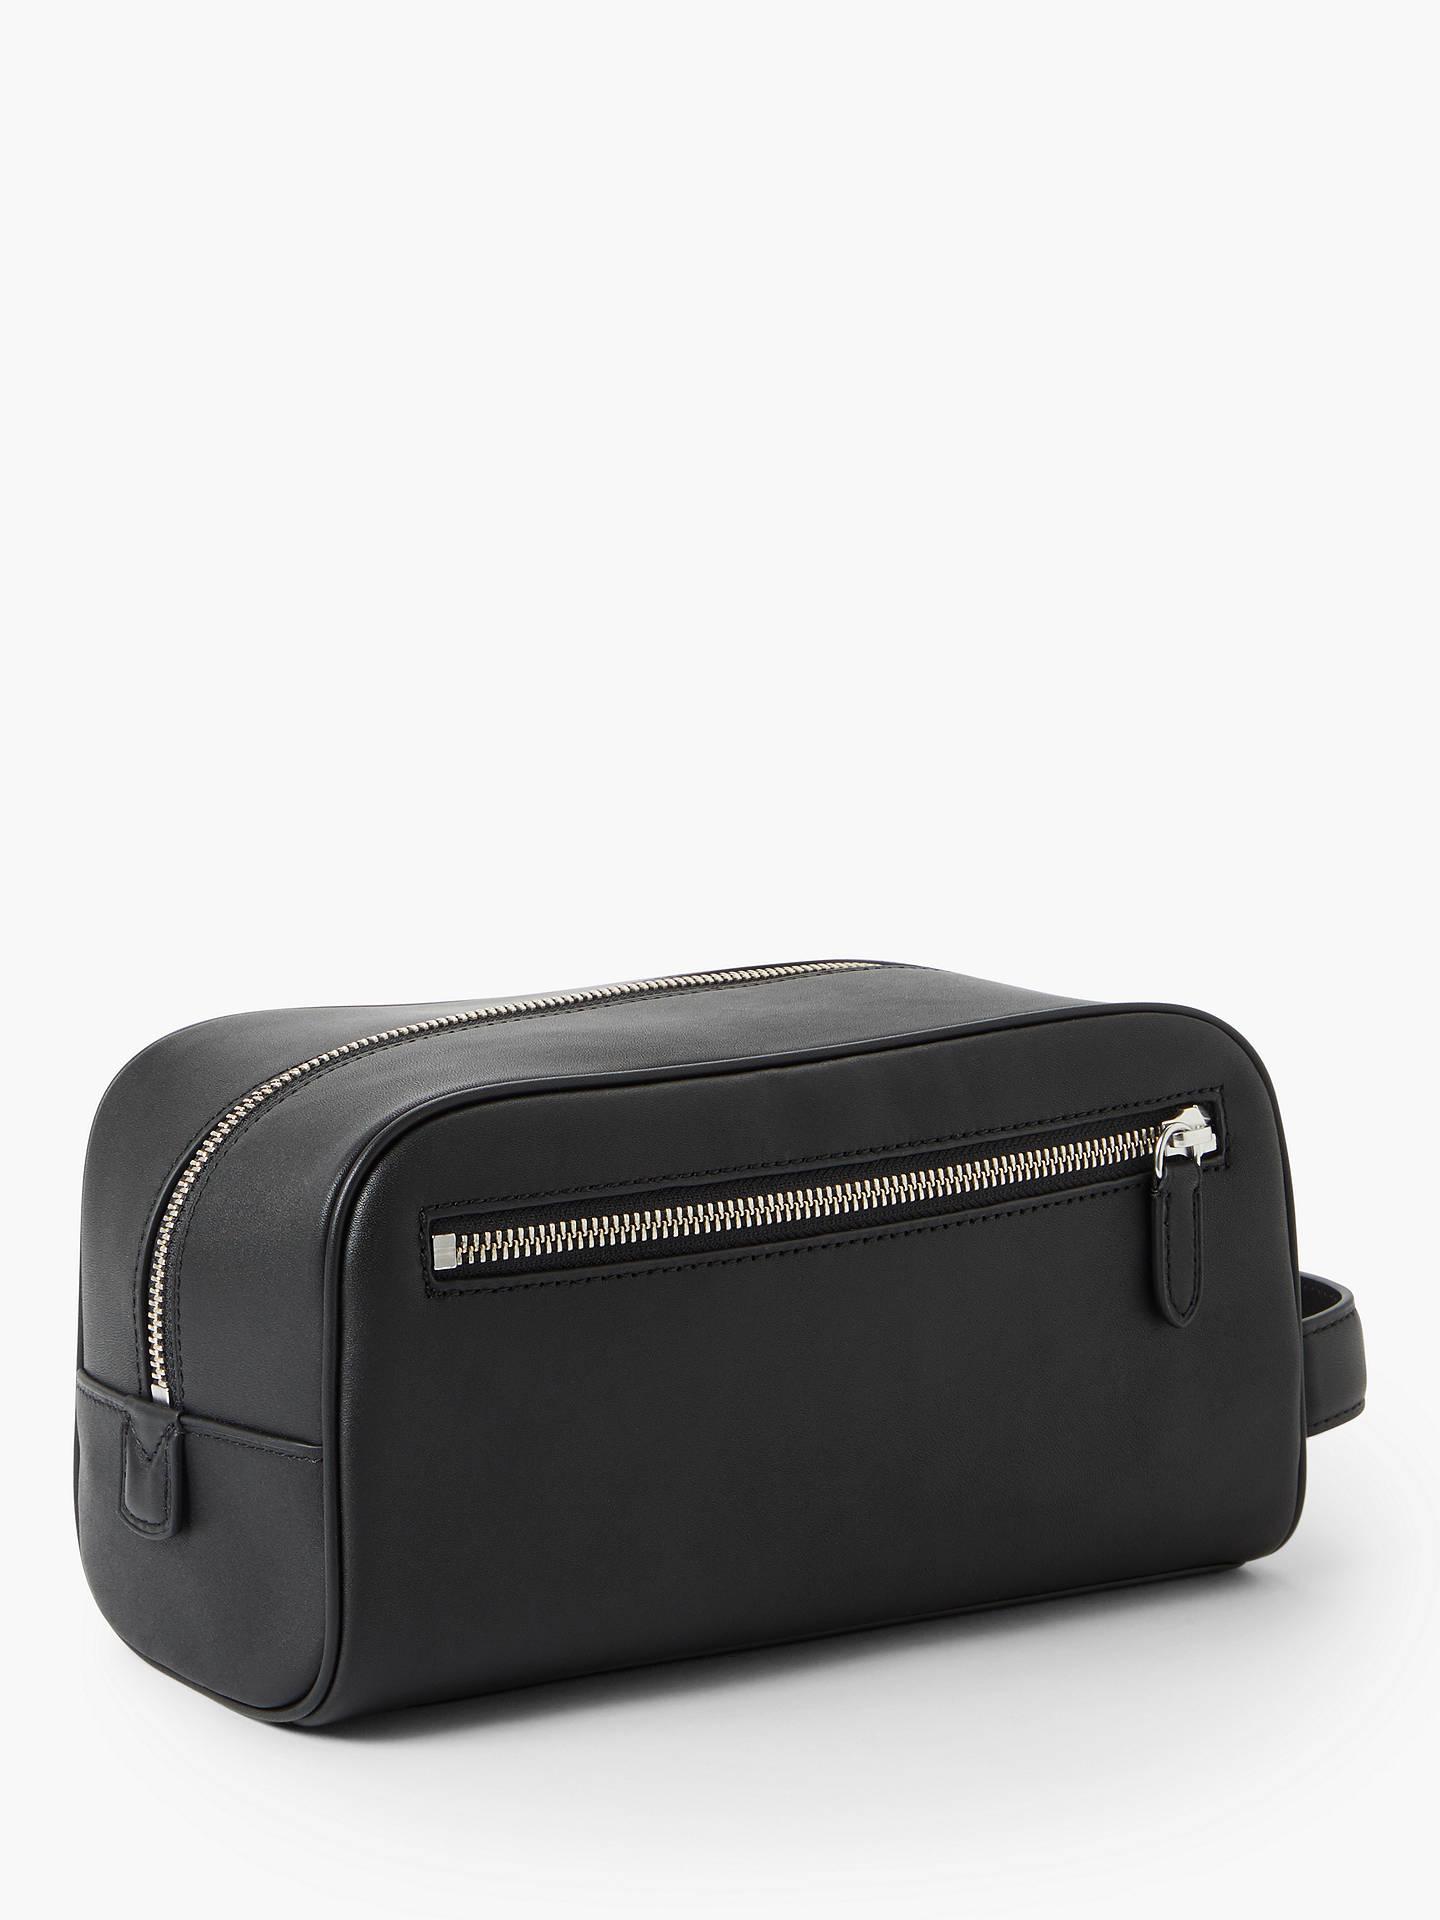 ddee6b208b ... Buy Polo Ralph Lauren Leather Wash Bag